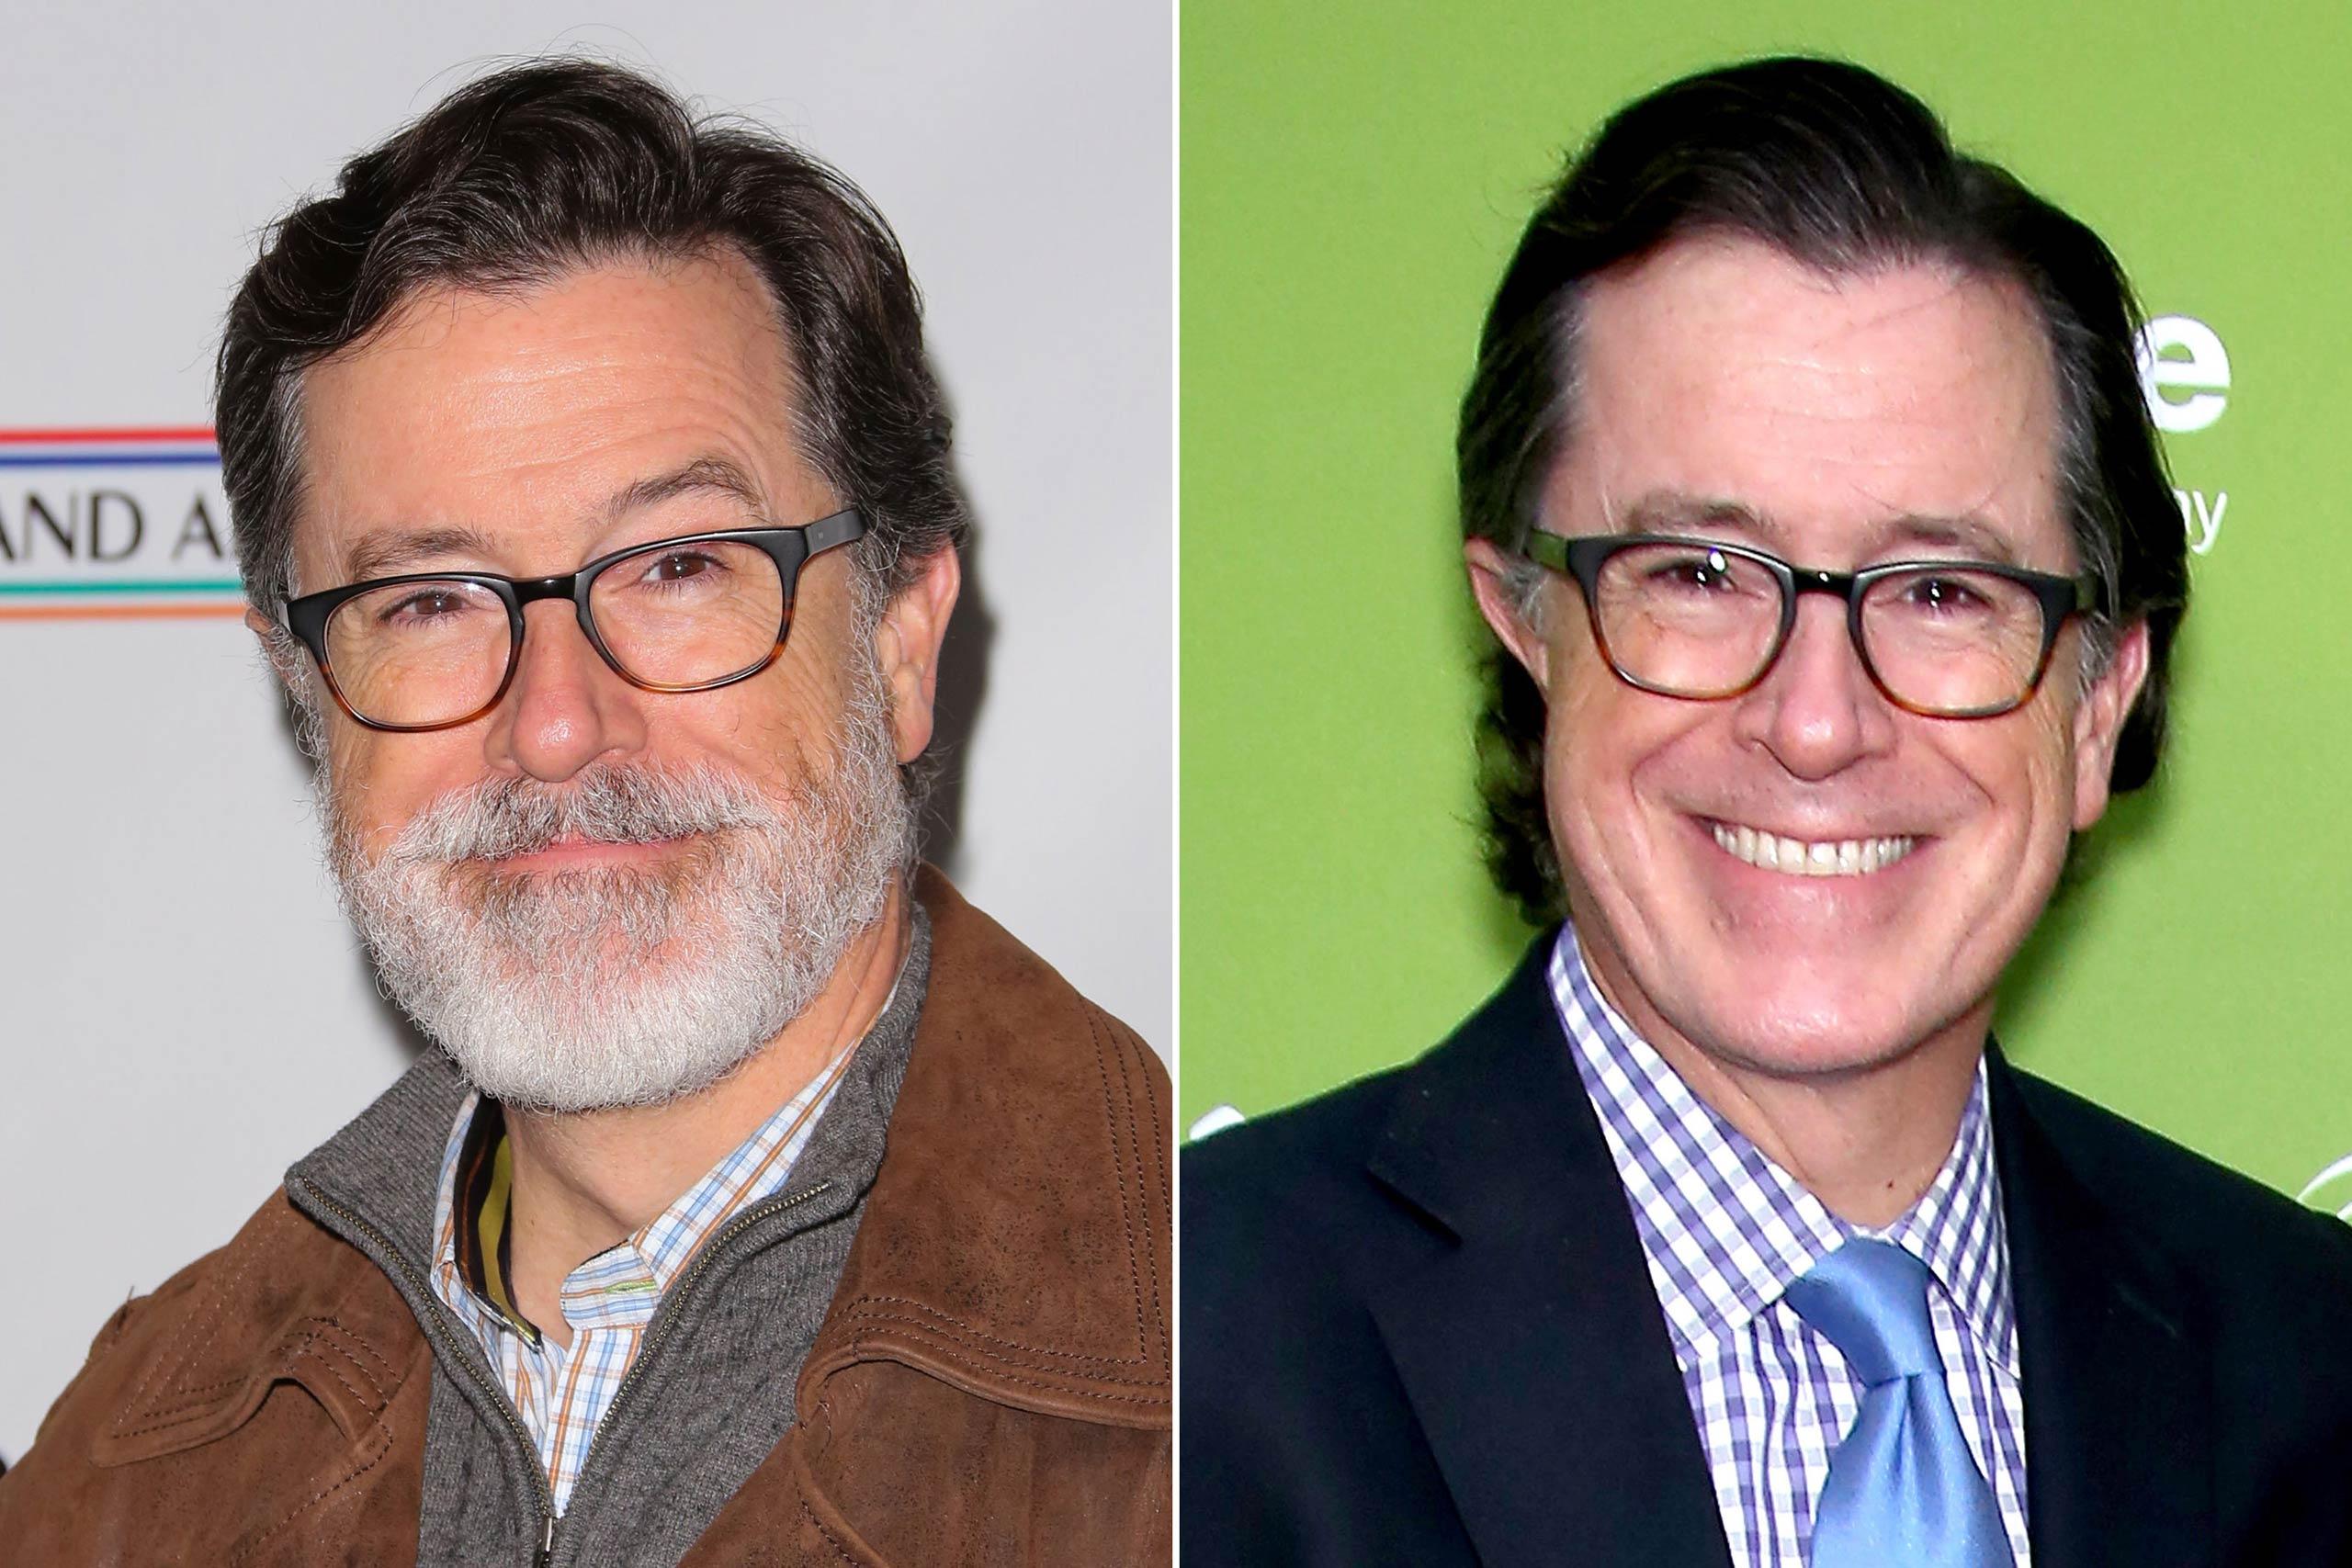 <strong>Stephen Colbert</strong>